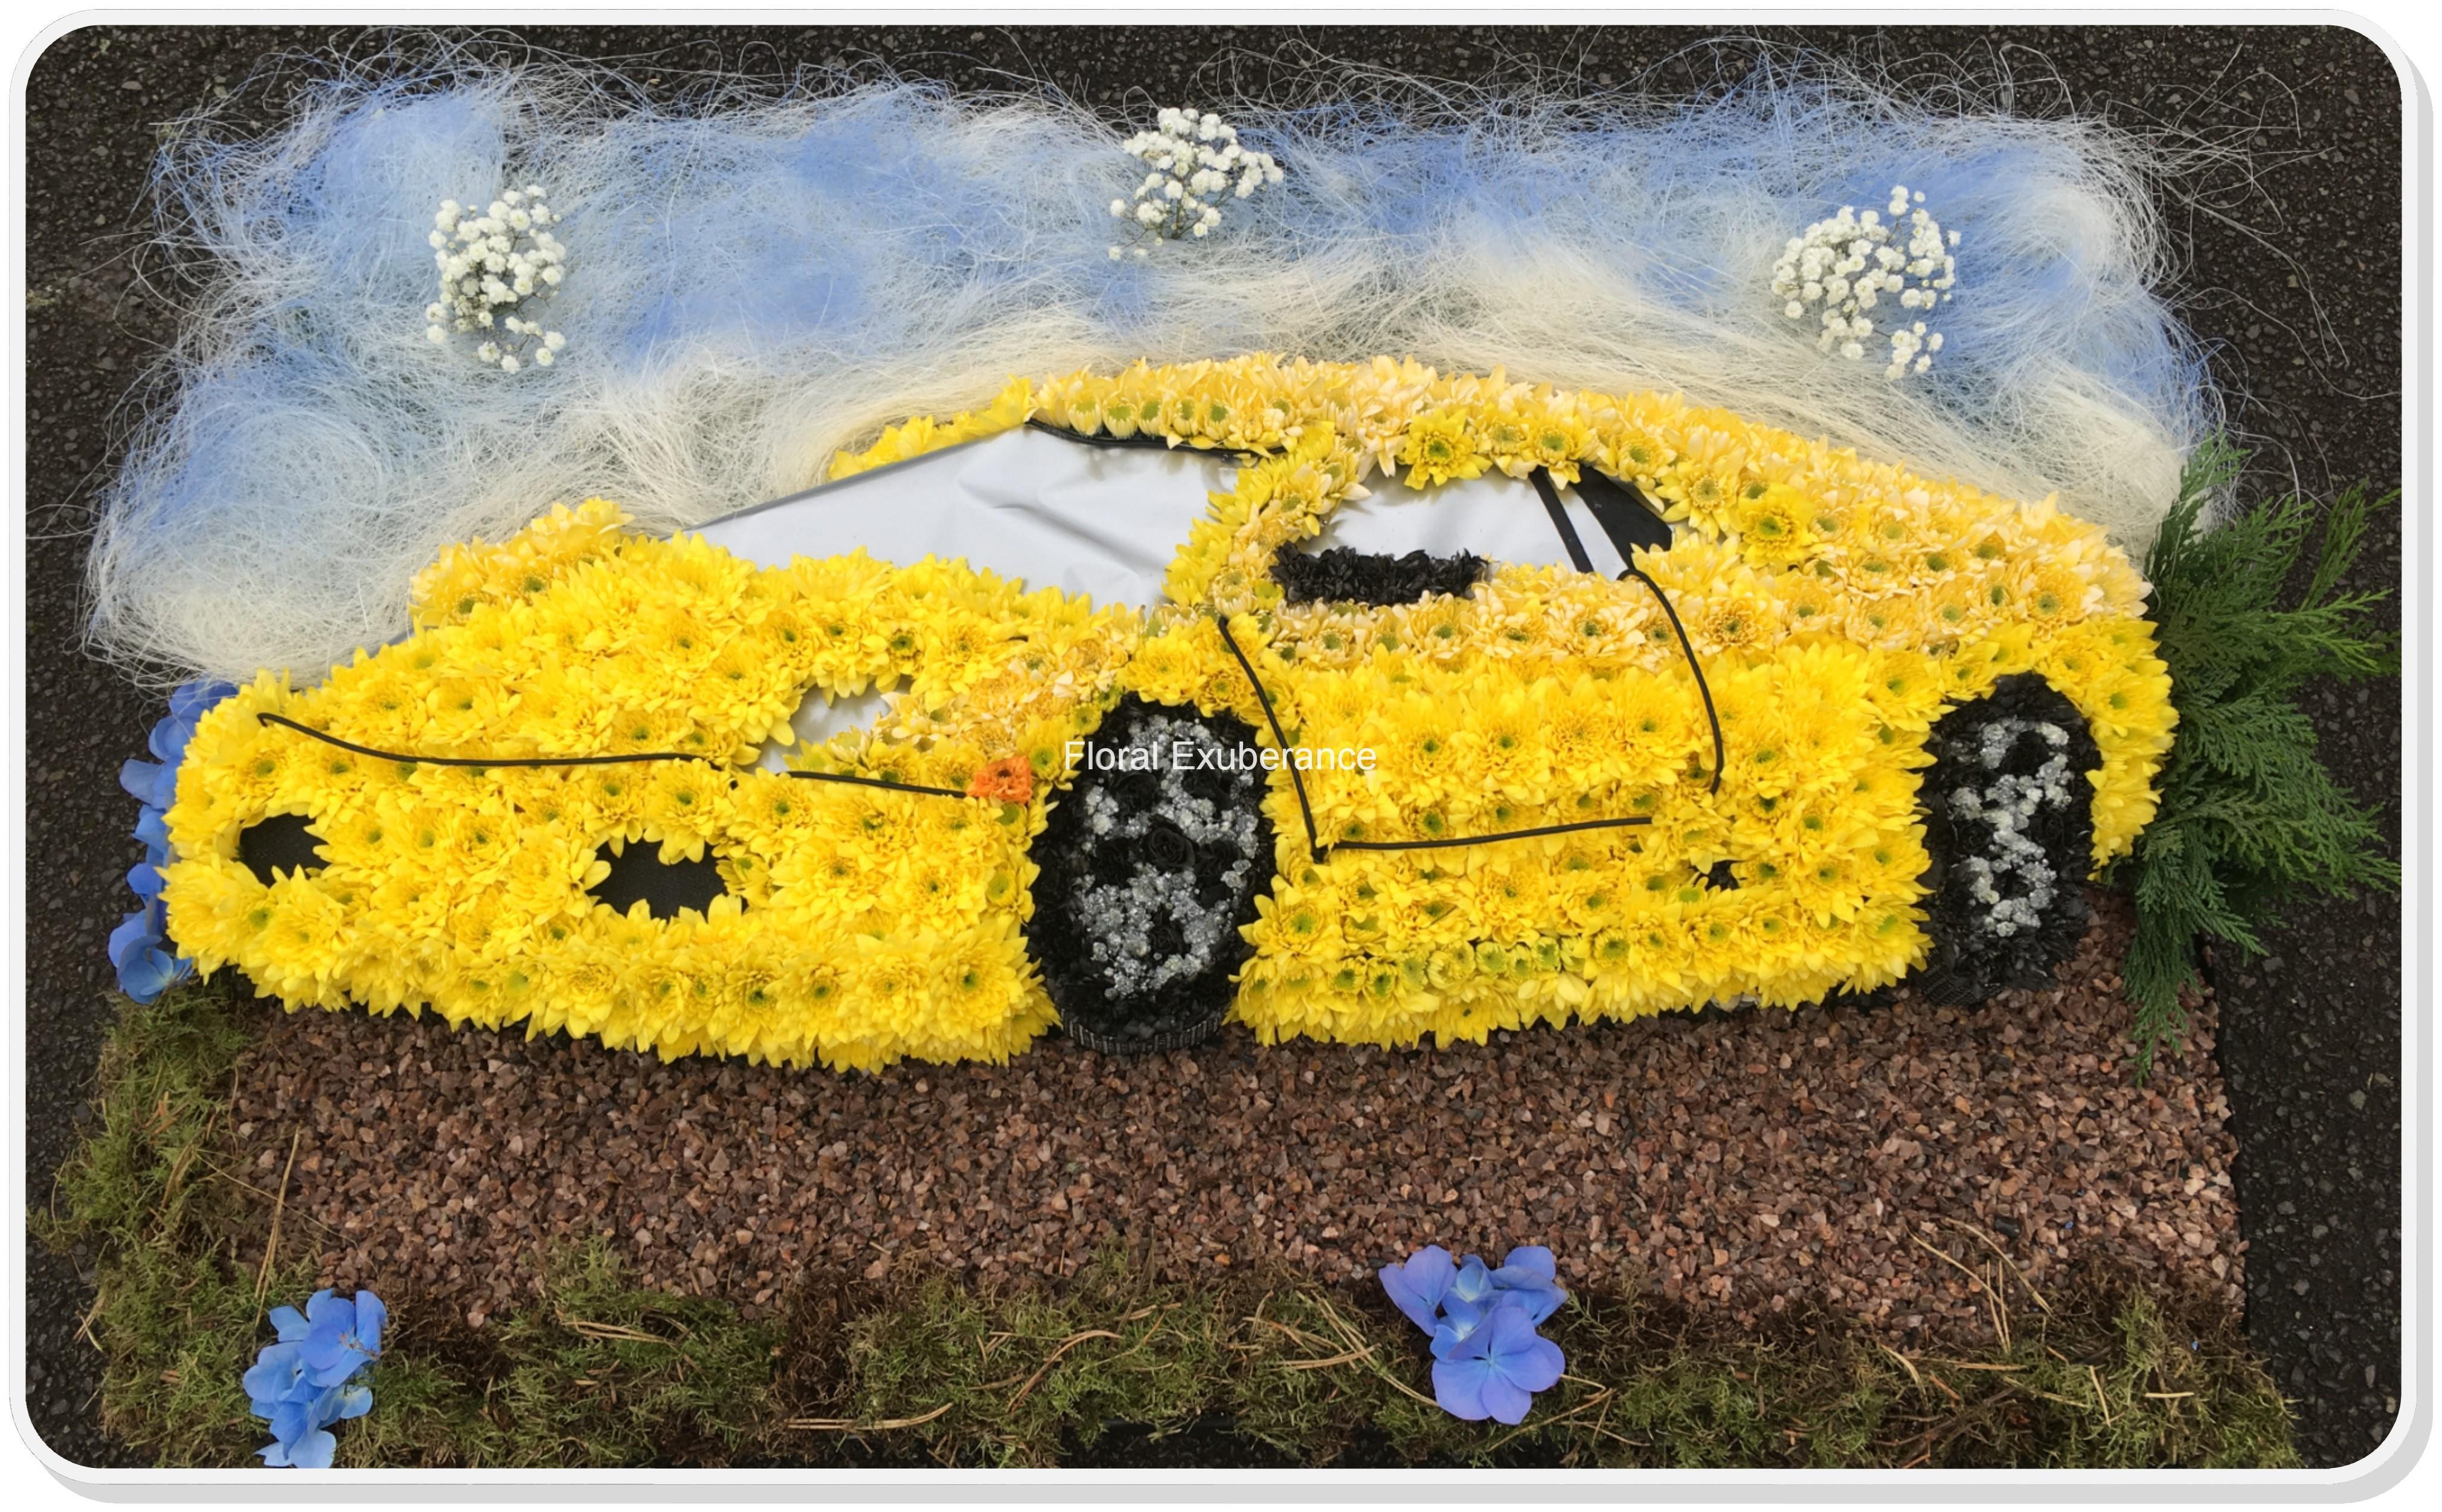 Lamborghini funeral flower tribute floral exuberance lamborghini funeral flower tribute izmirmasajfo